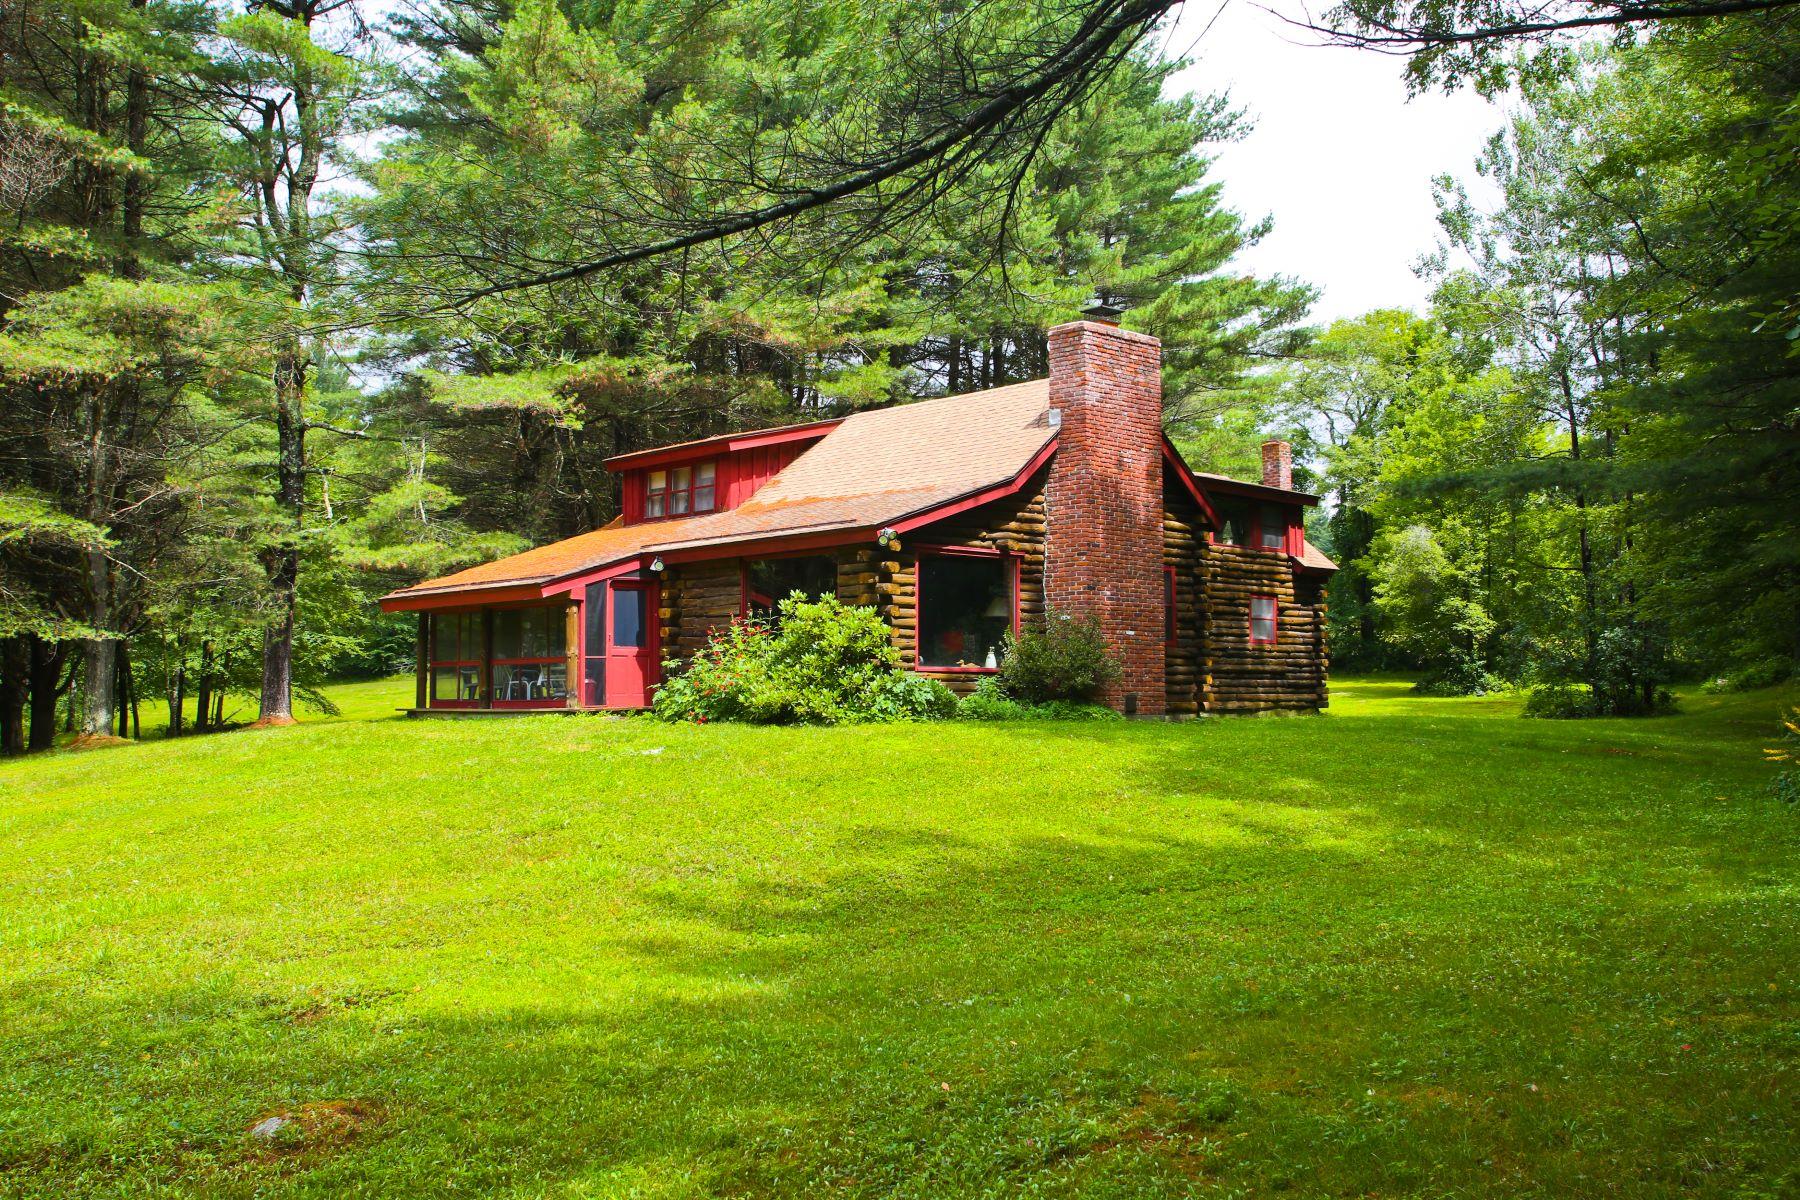 Single Family Home for Active at Rustic Home Outside Of Great Barrington Near Butternut Brett Rd Monterey, Massachusetts 01245 United States